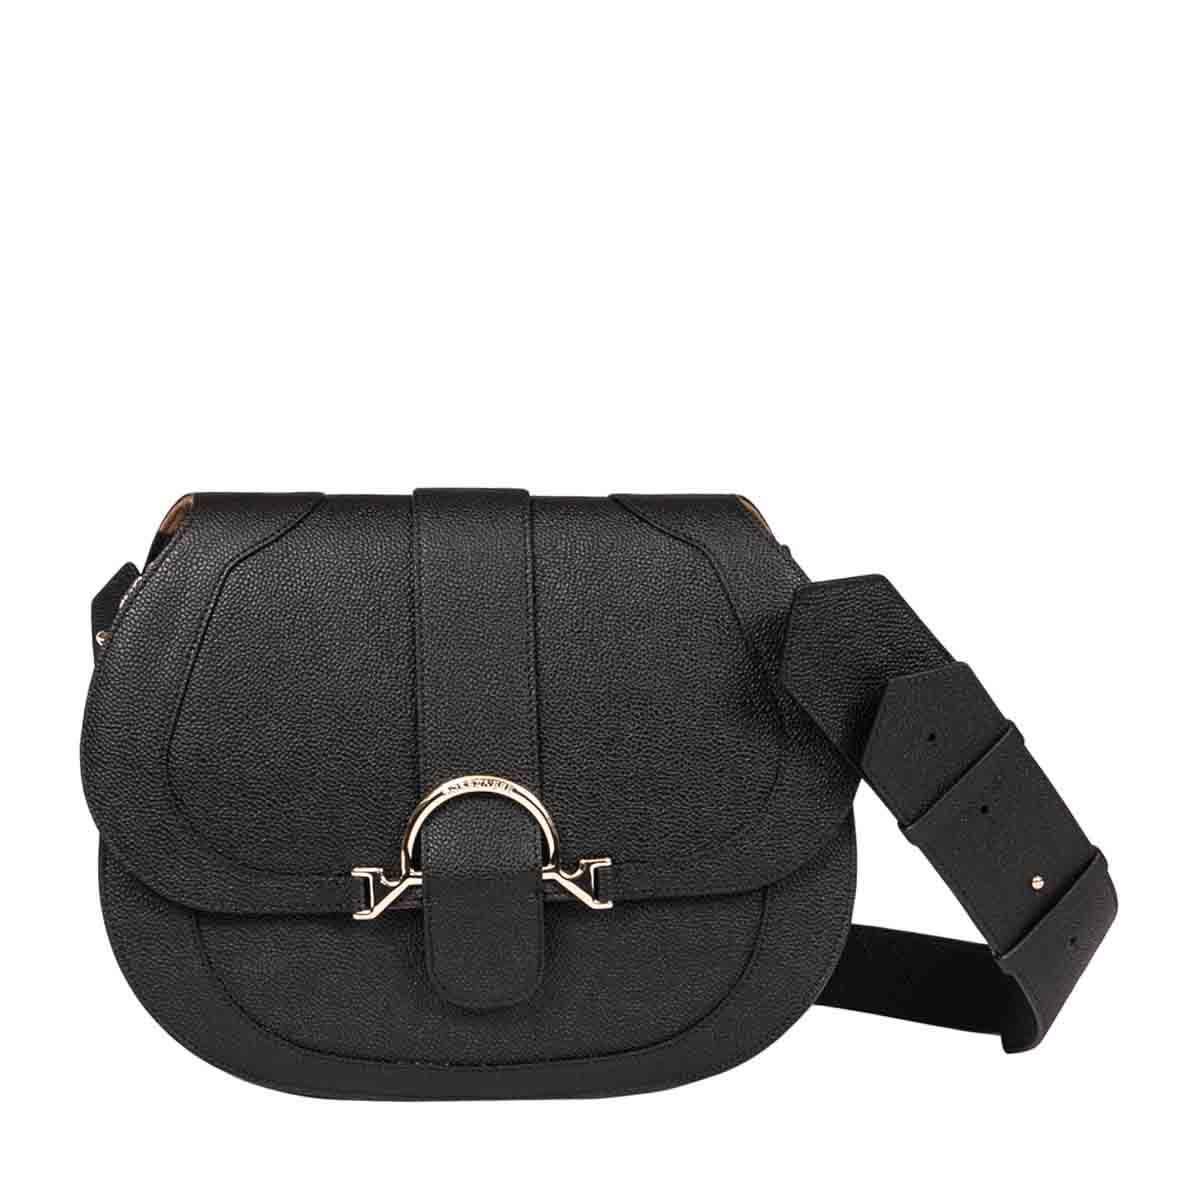 Medium 110 Bag